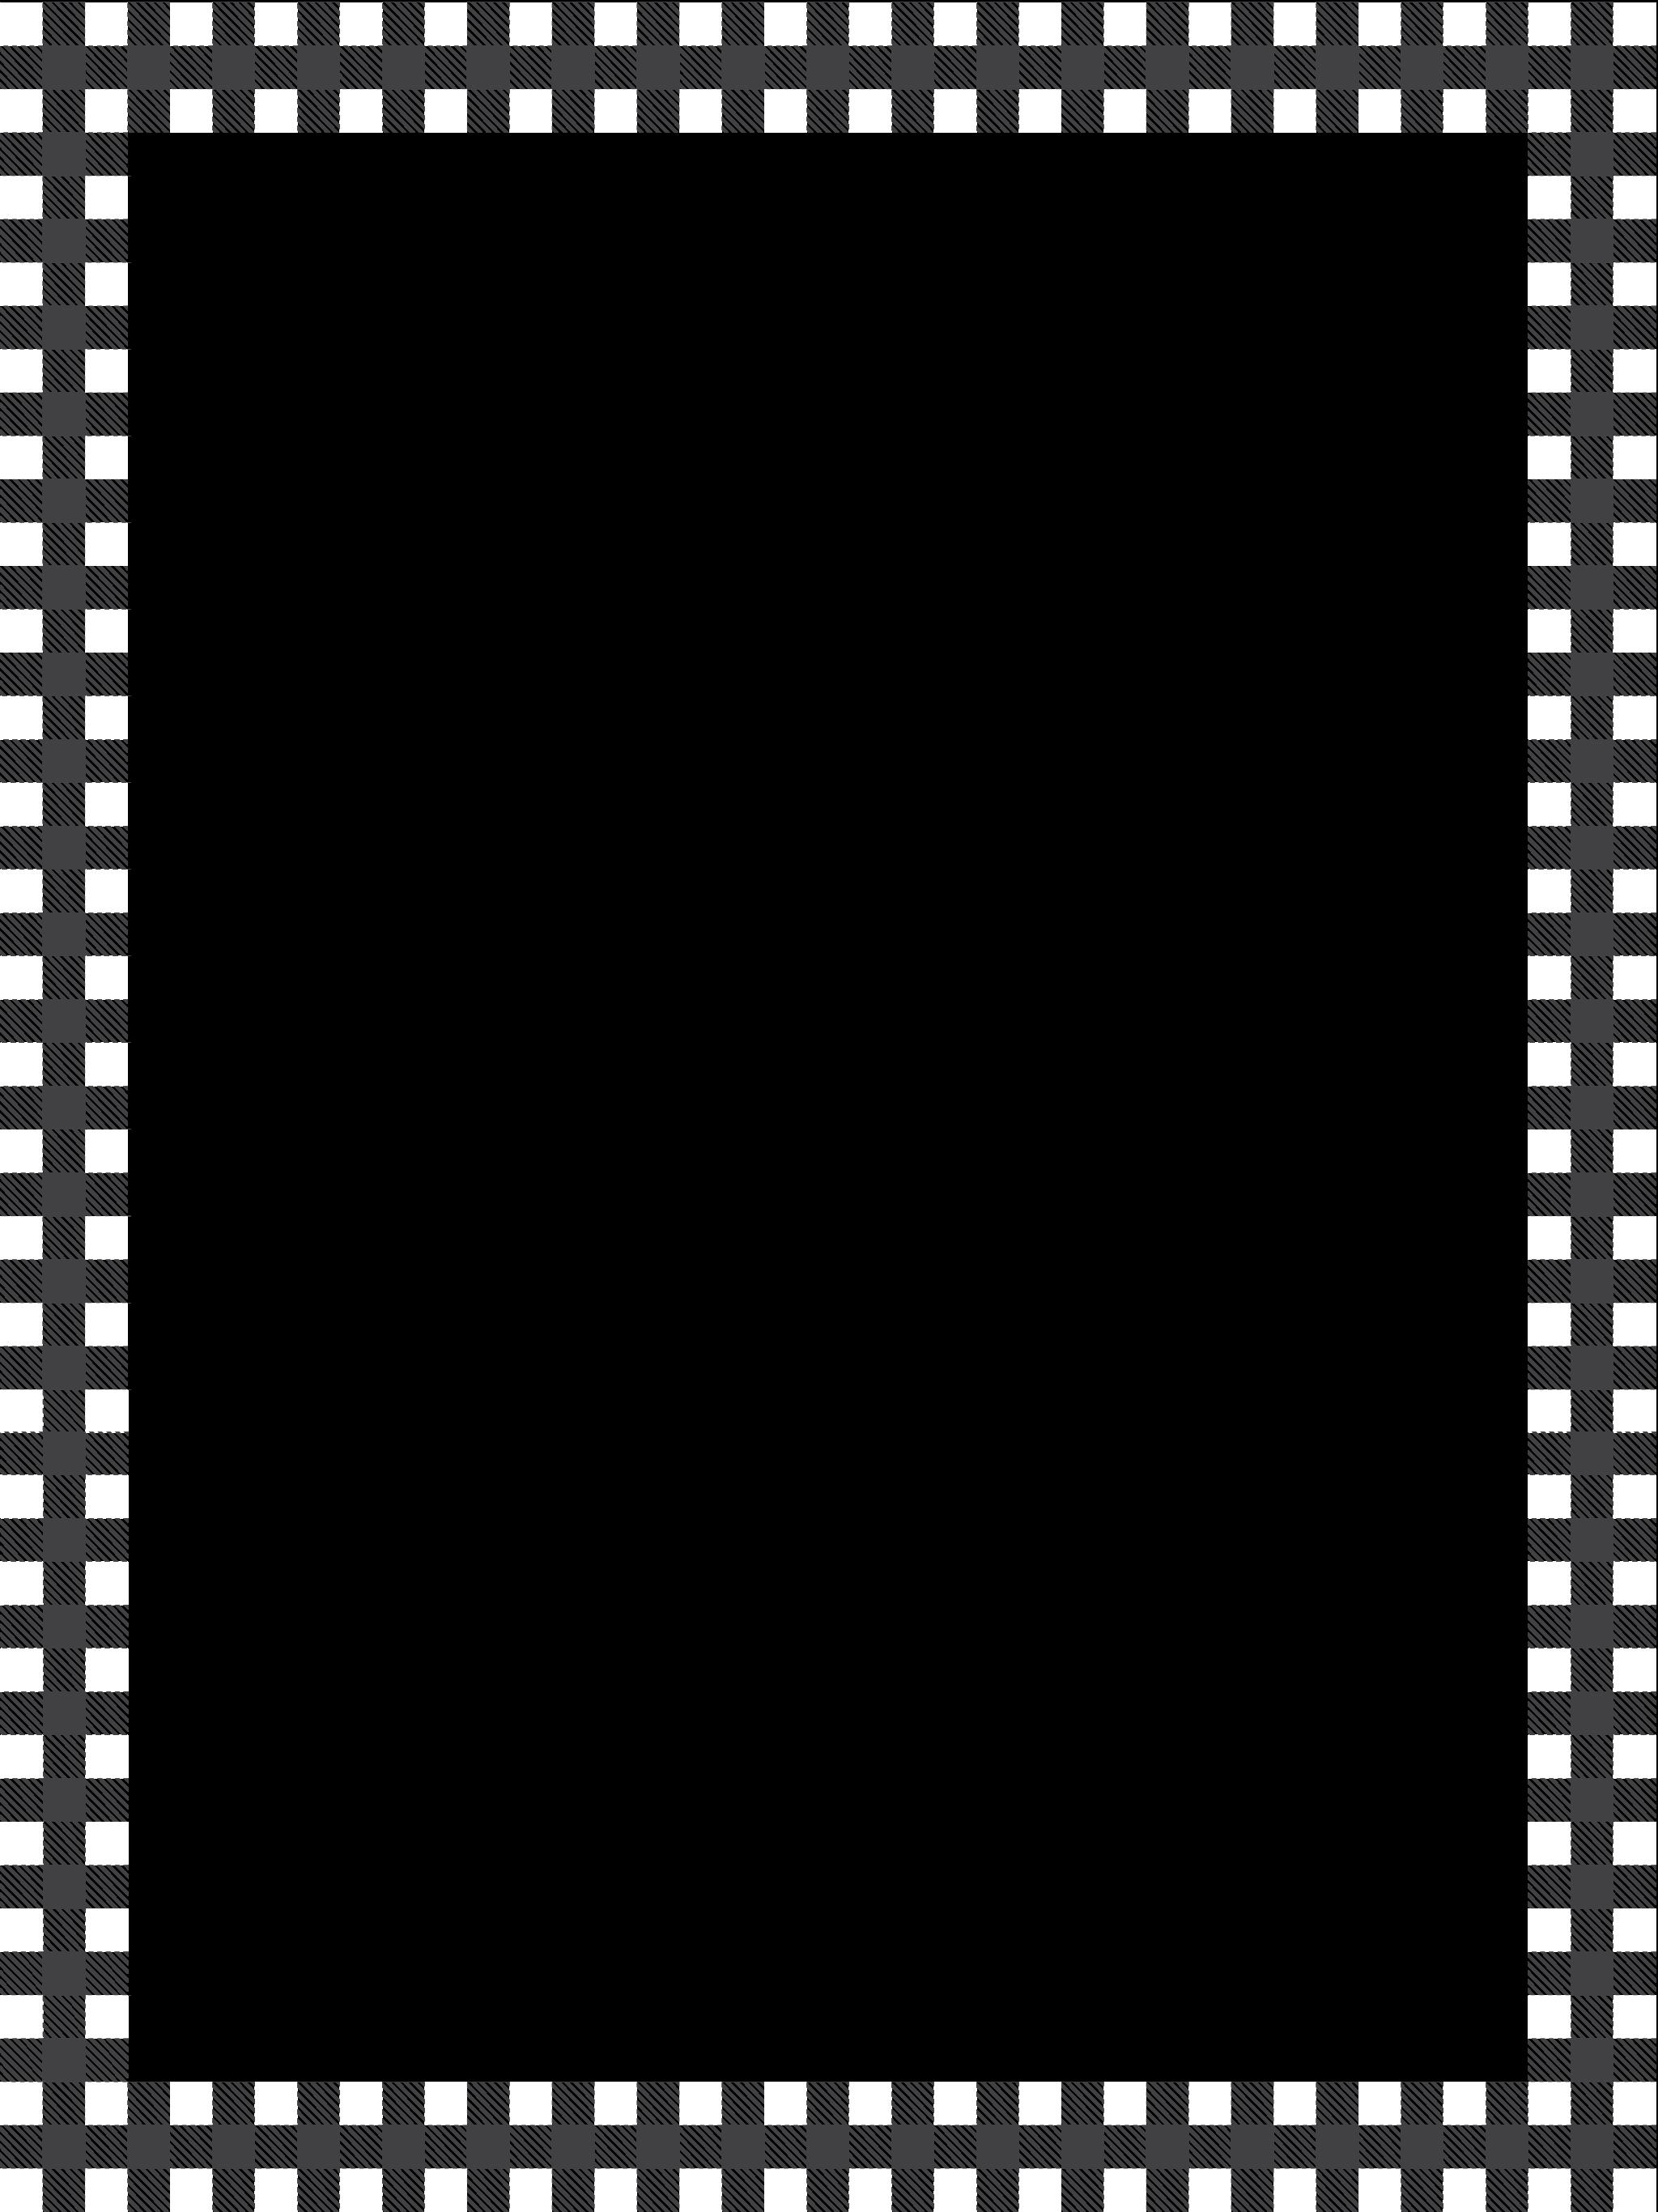 Ipad Vertical_2048x2732_Plaid_Black.png